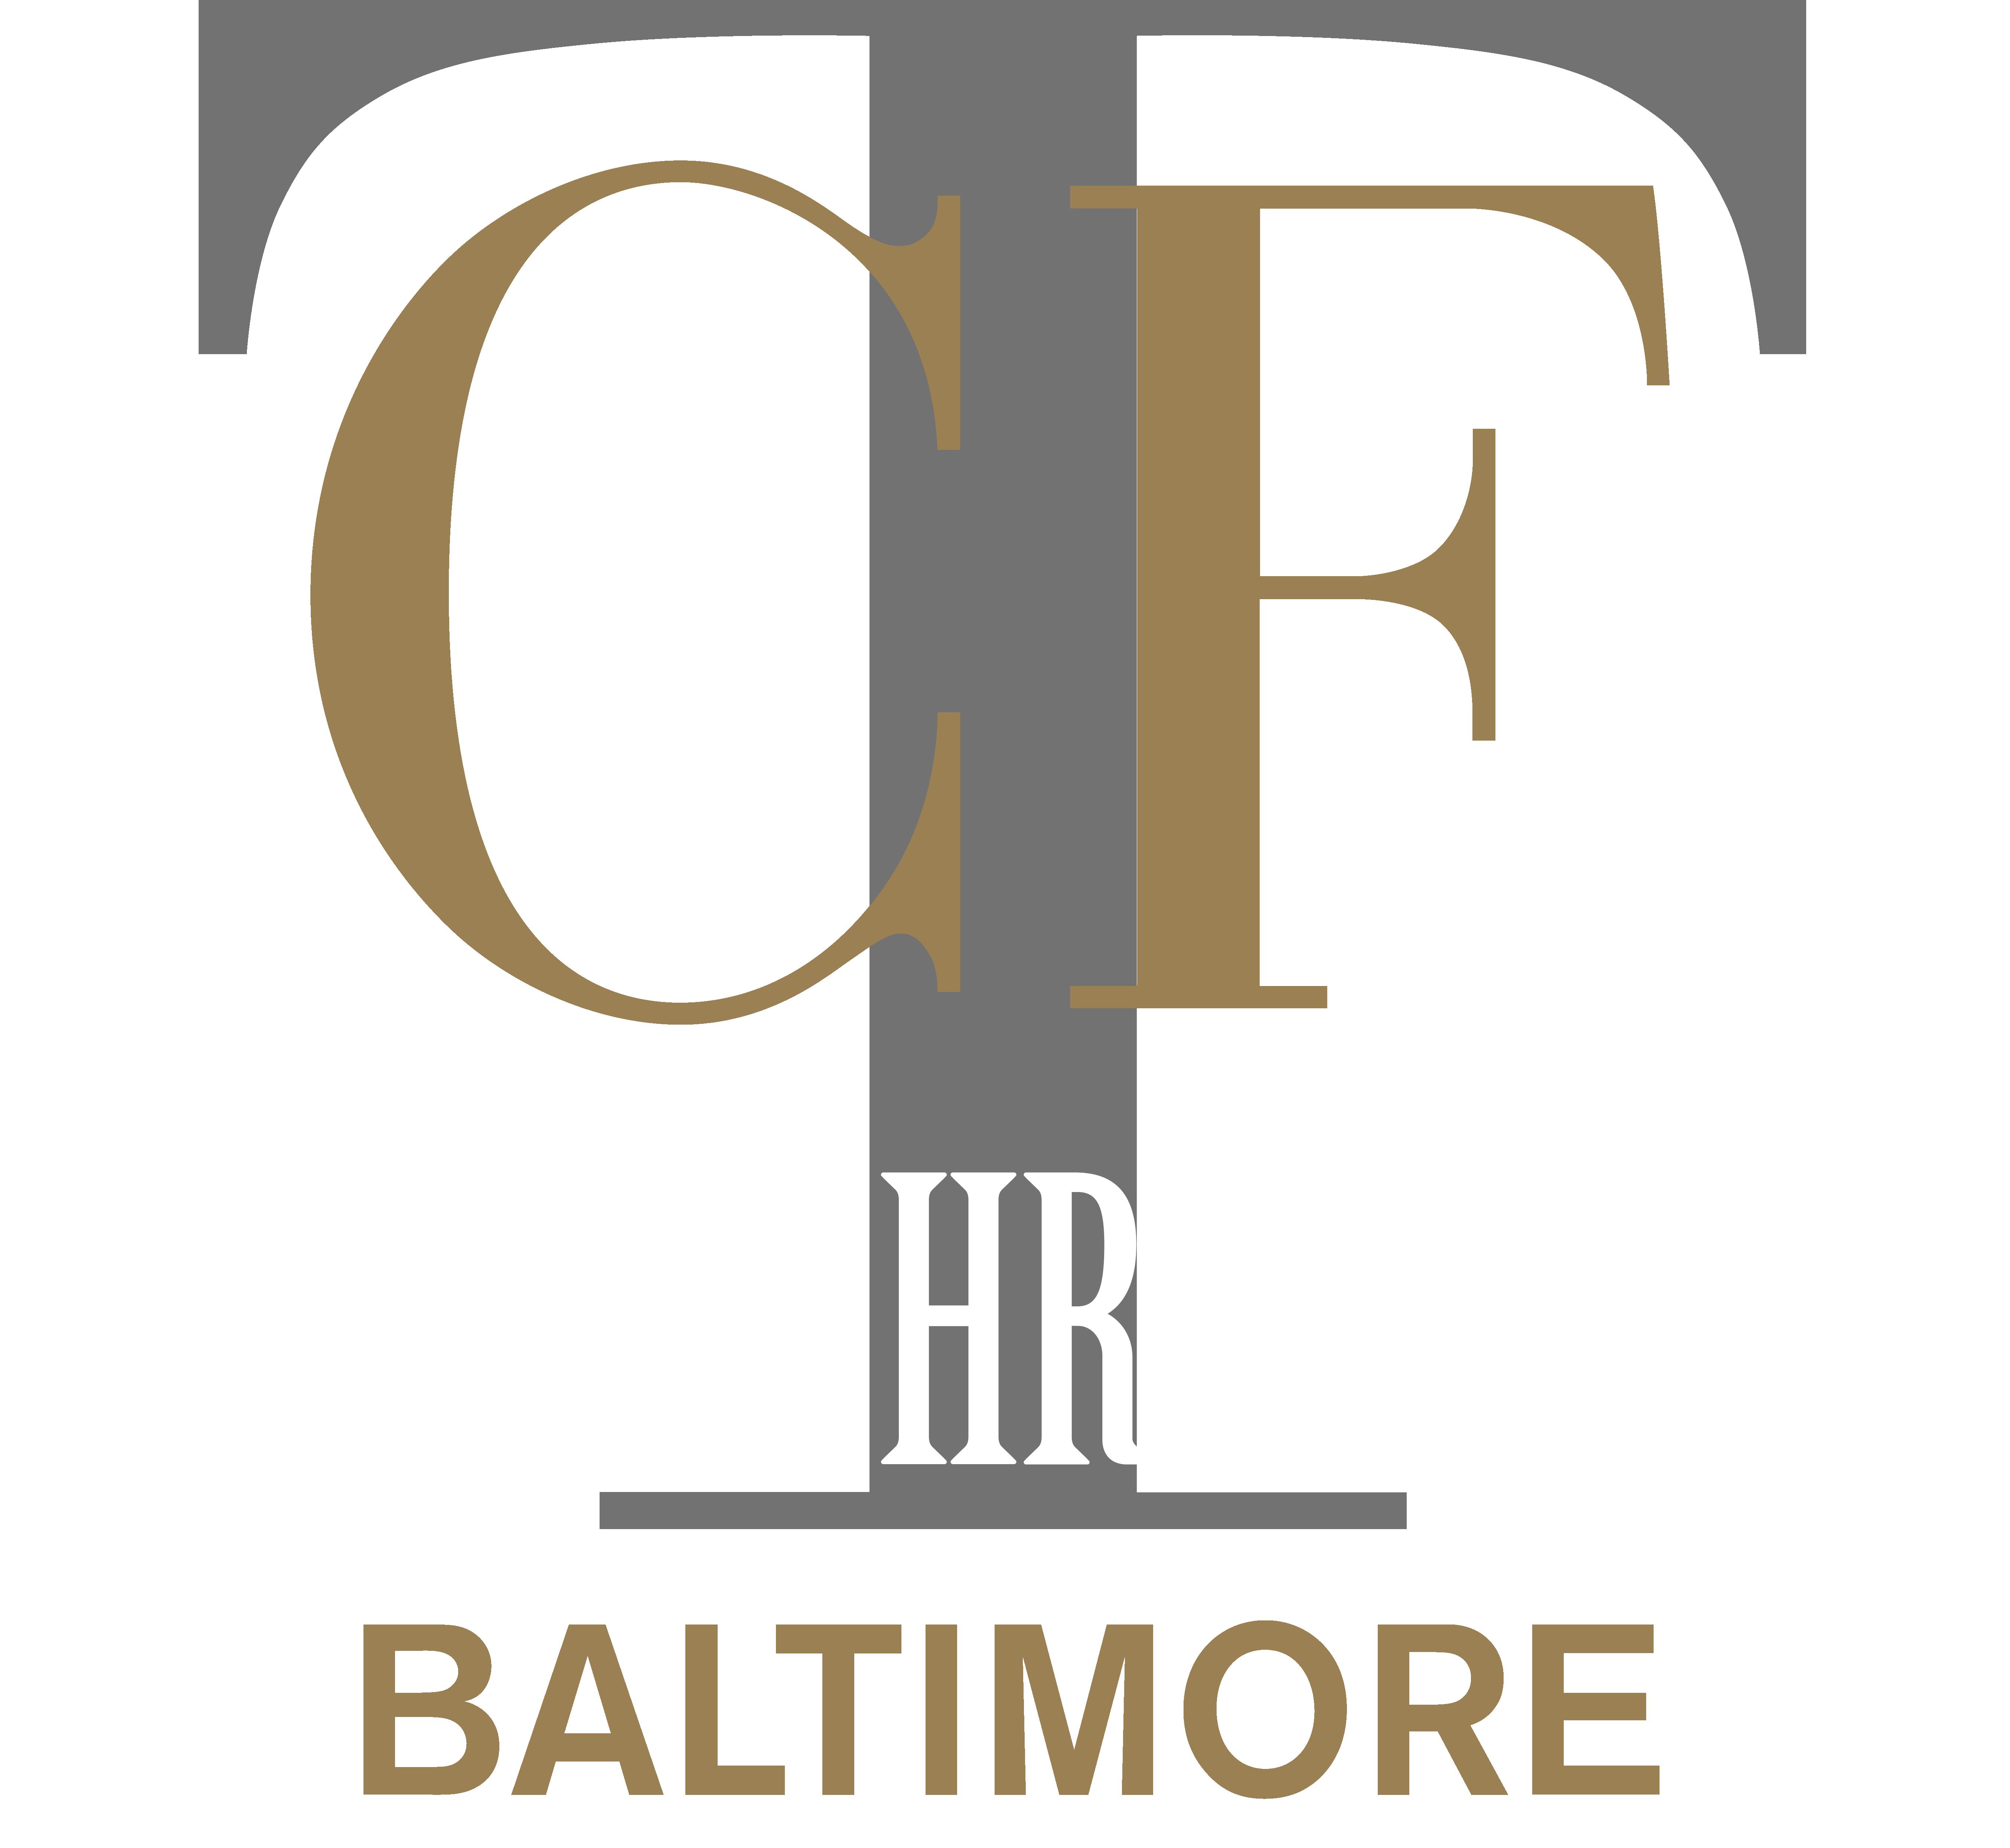 The Cochran Firm Baltimore